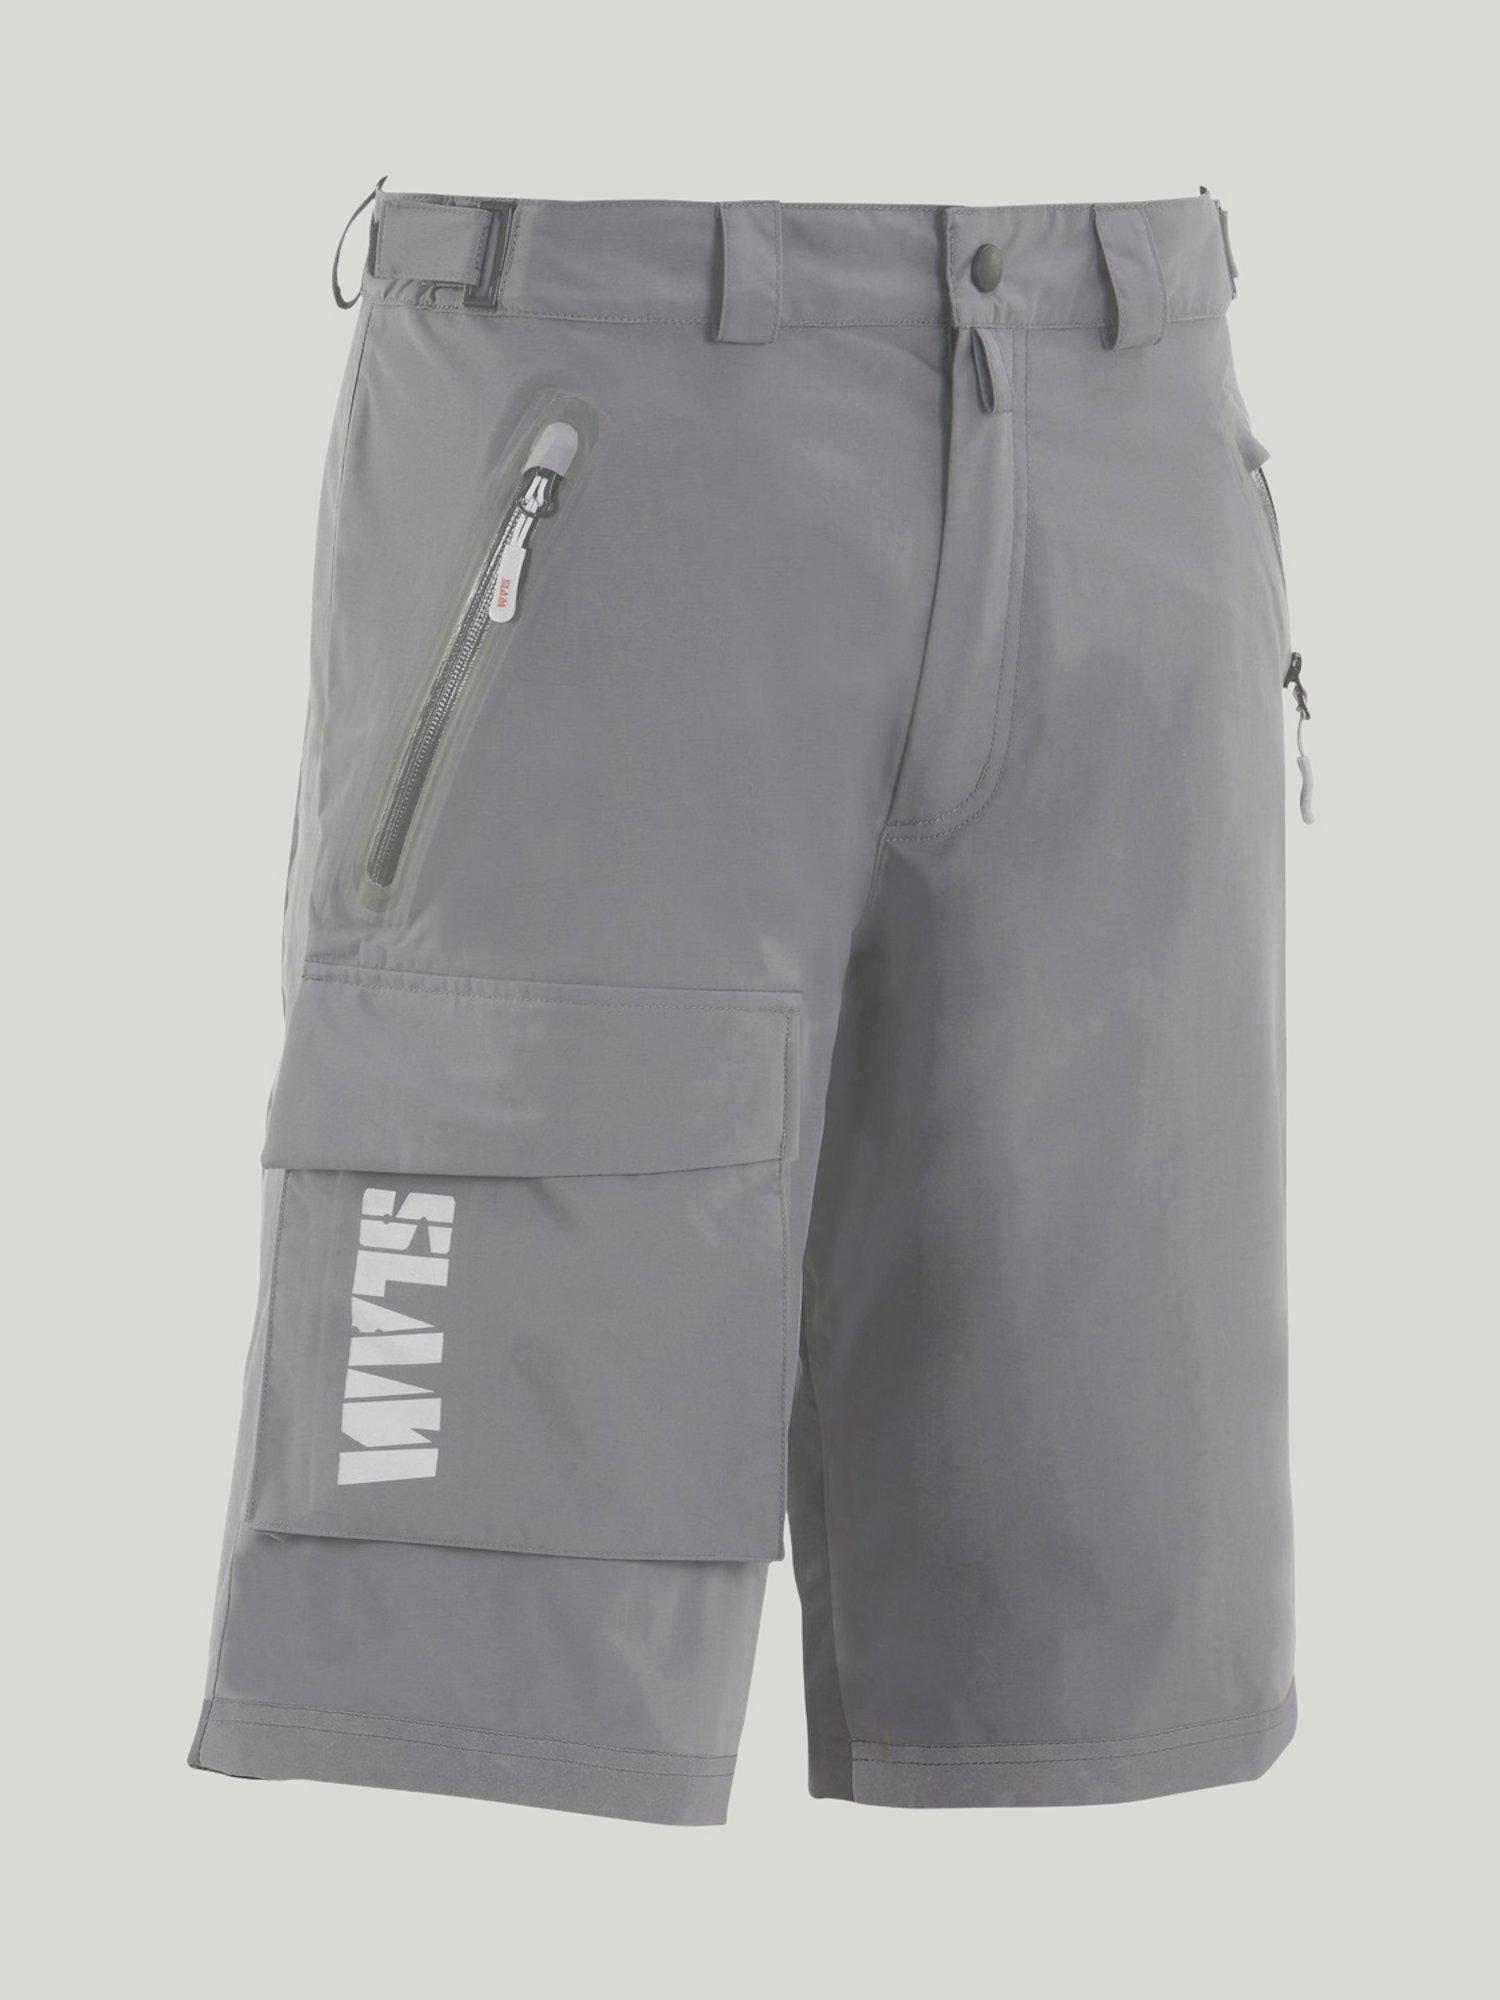 Pantalones cortos Force 2 - Gris